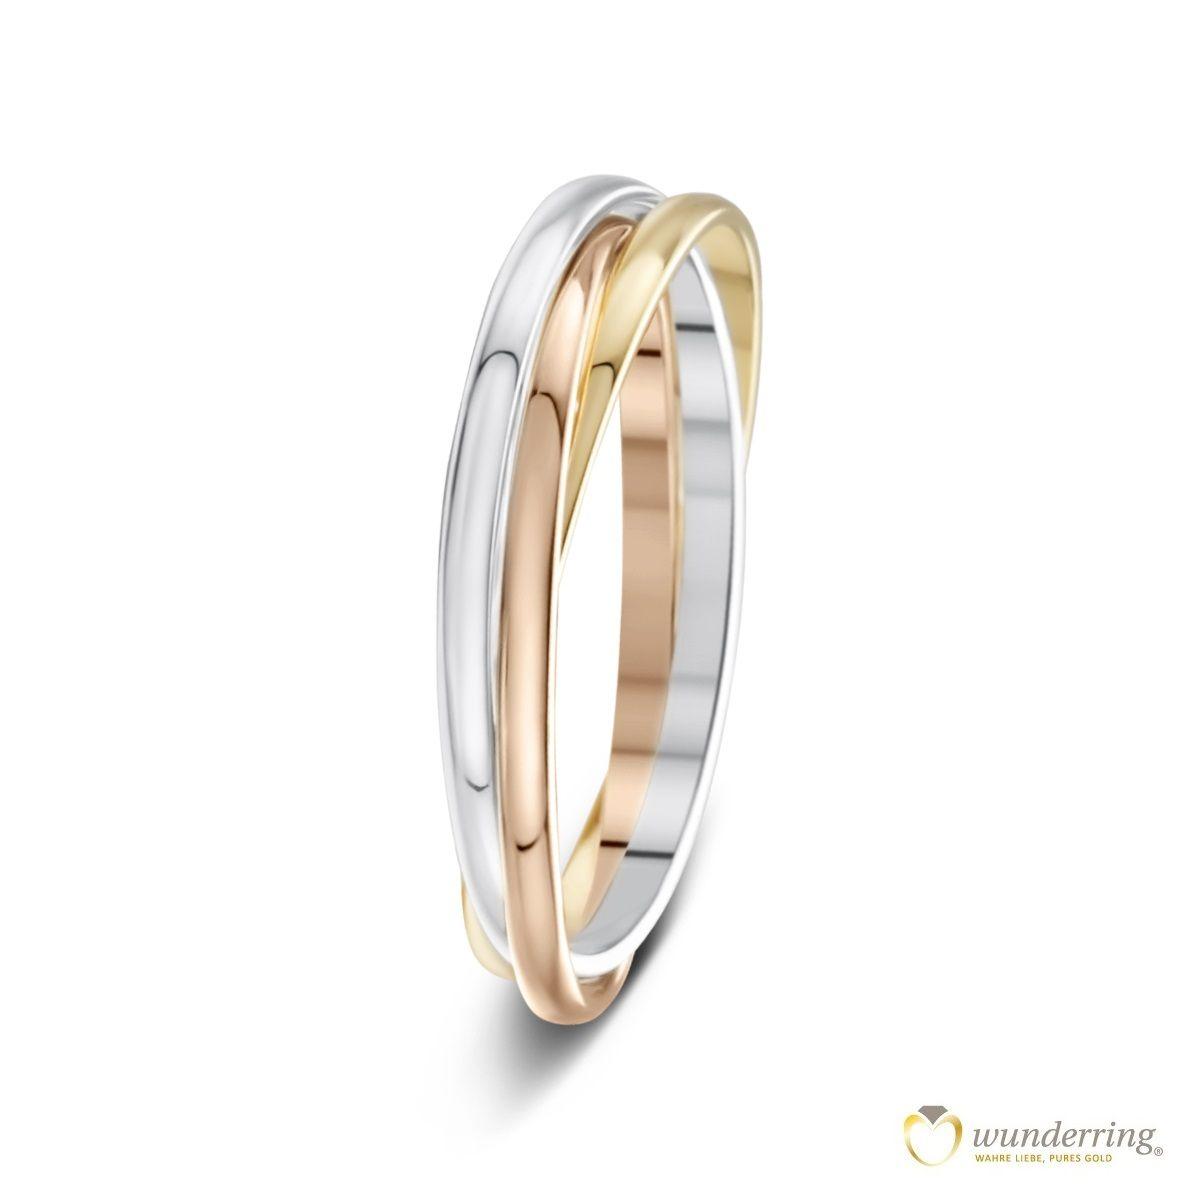 Goldring schmal  Filigraner, dreifarbiger Goldring. Schmaler Ring zum Kombinieren ...